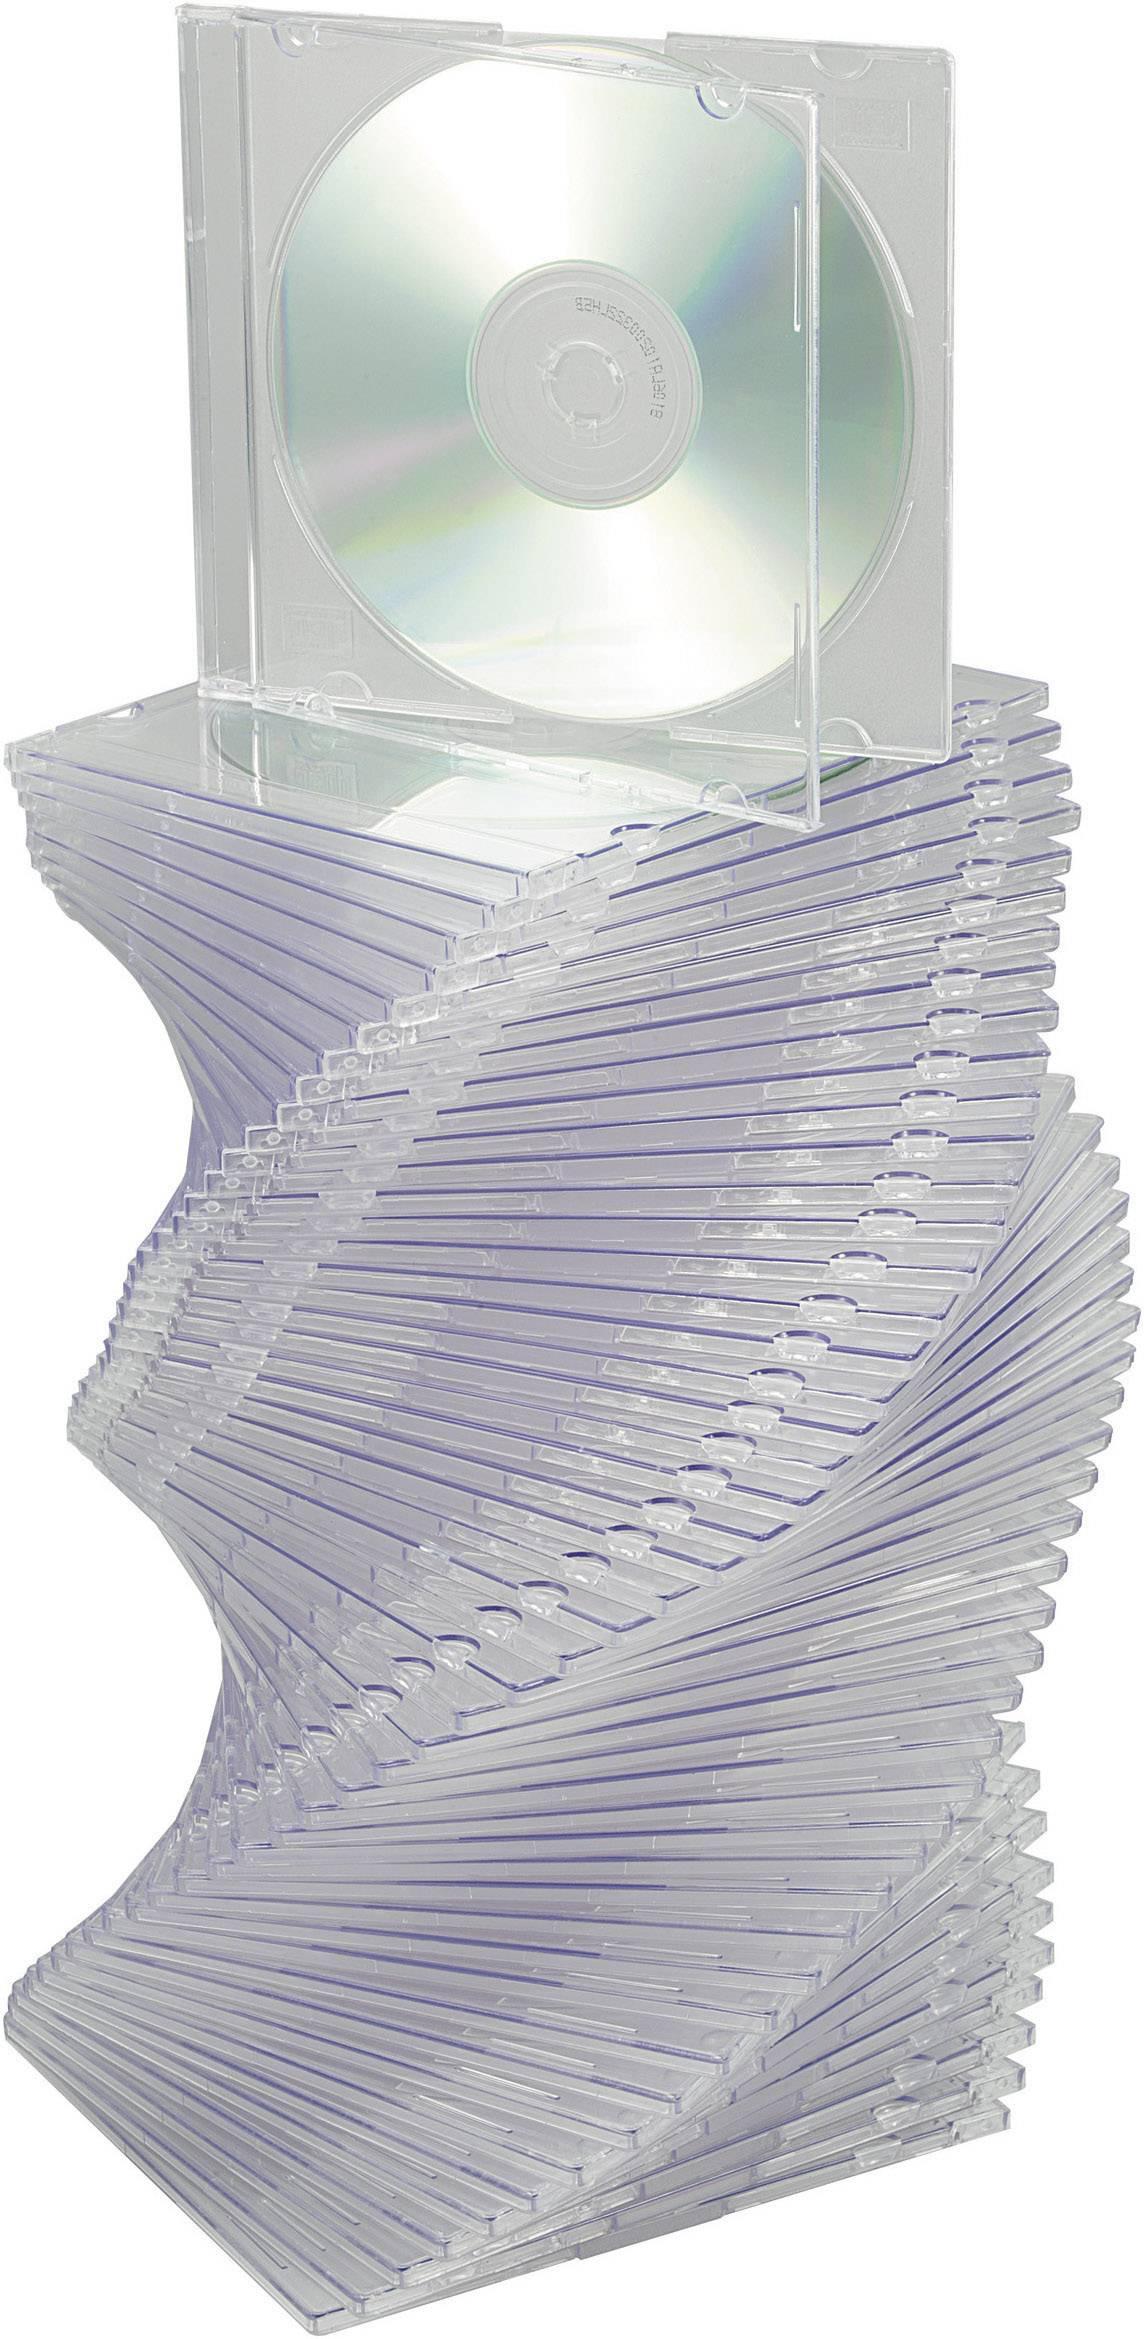 Krabičky Slim pro CD, 50 ks